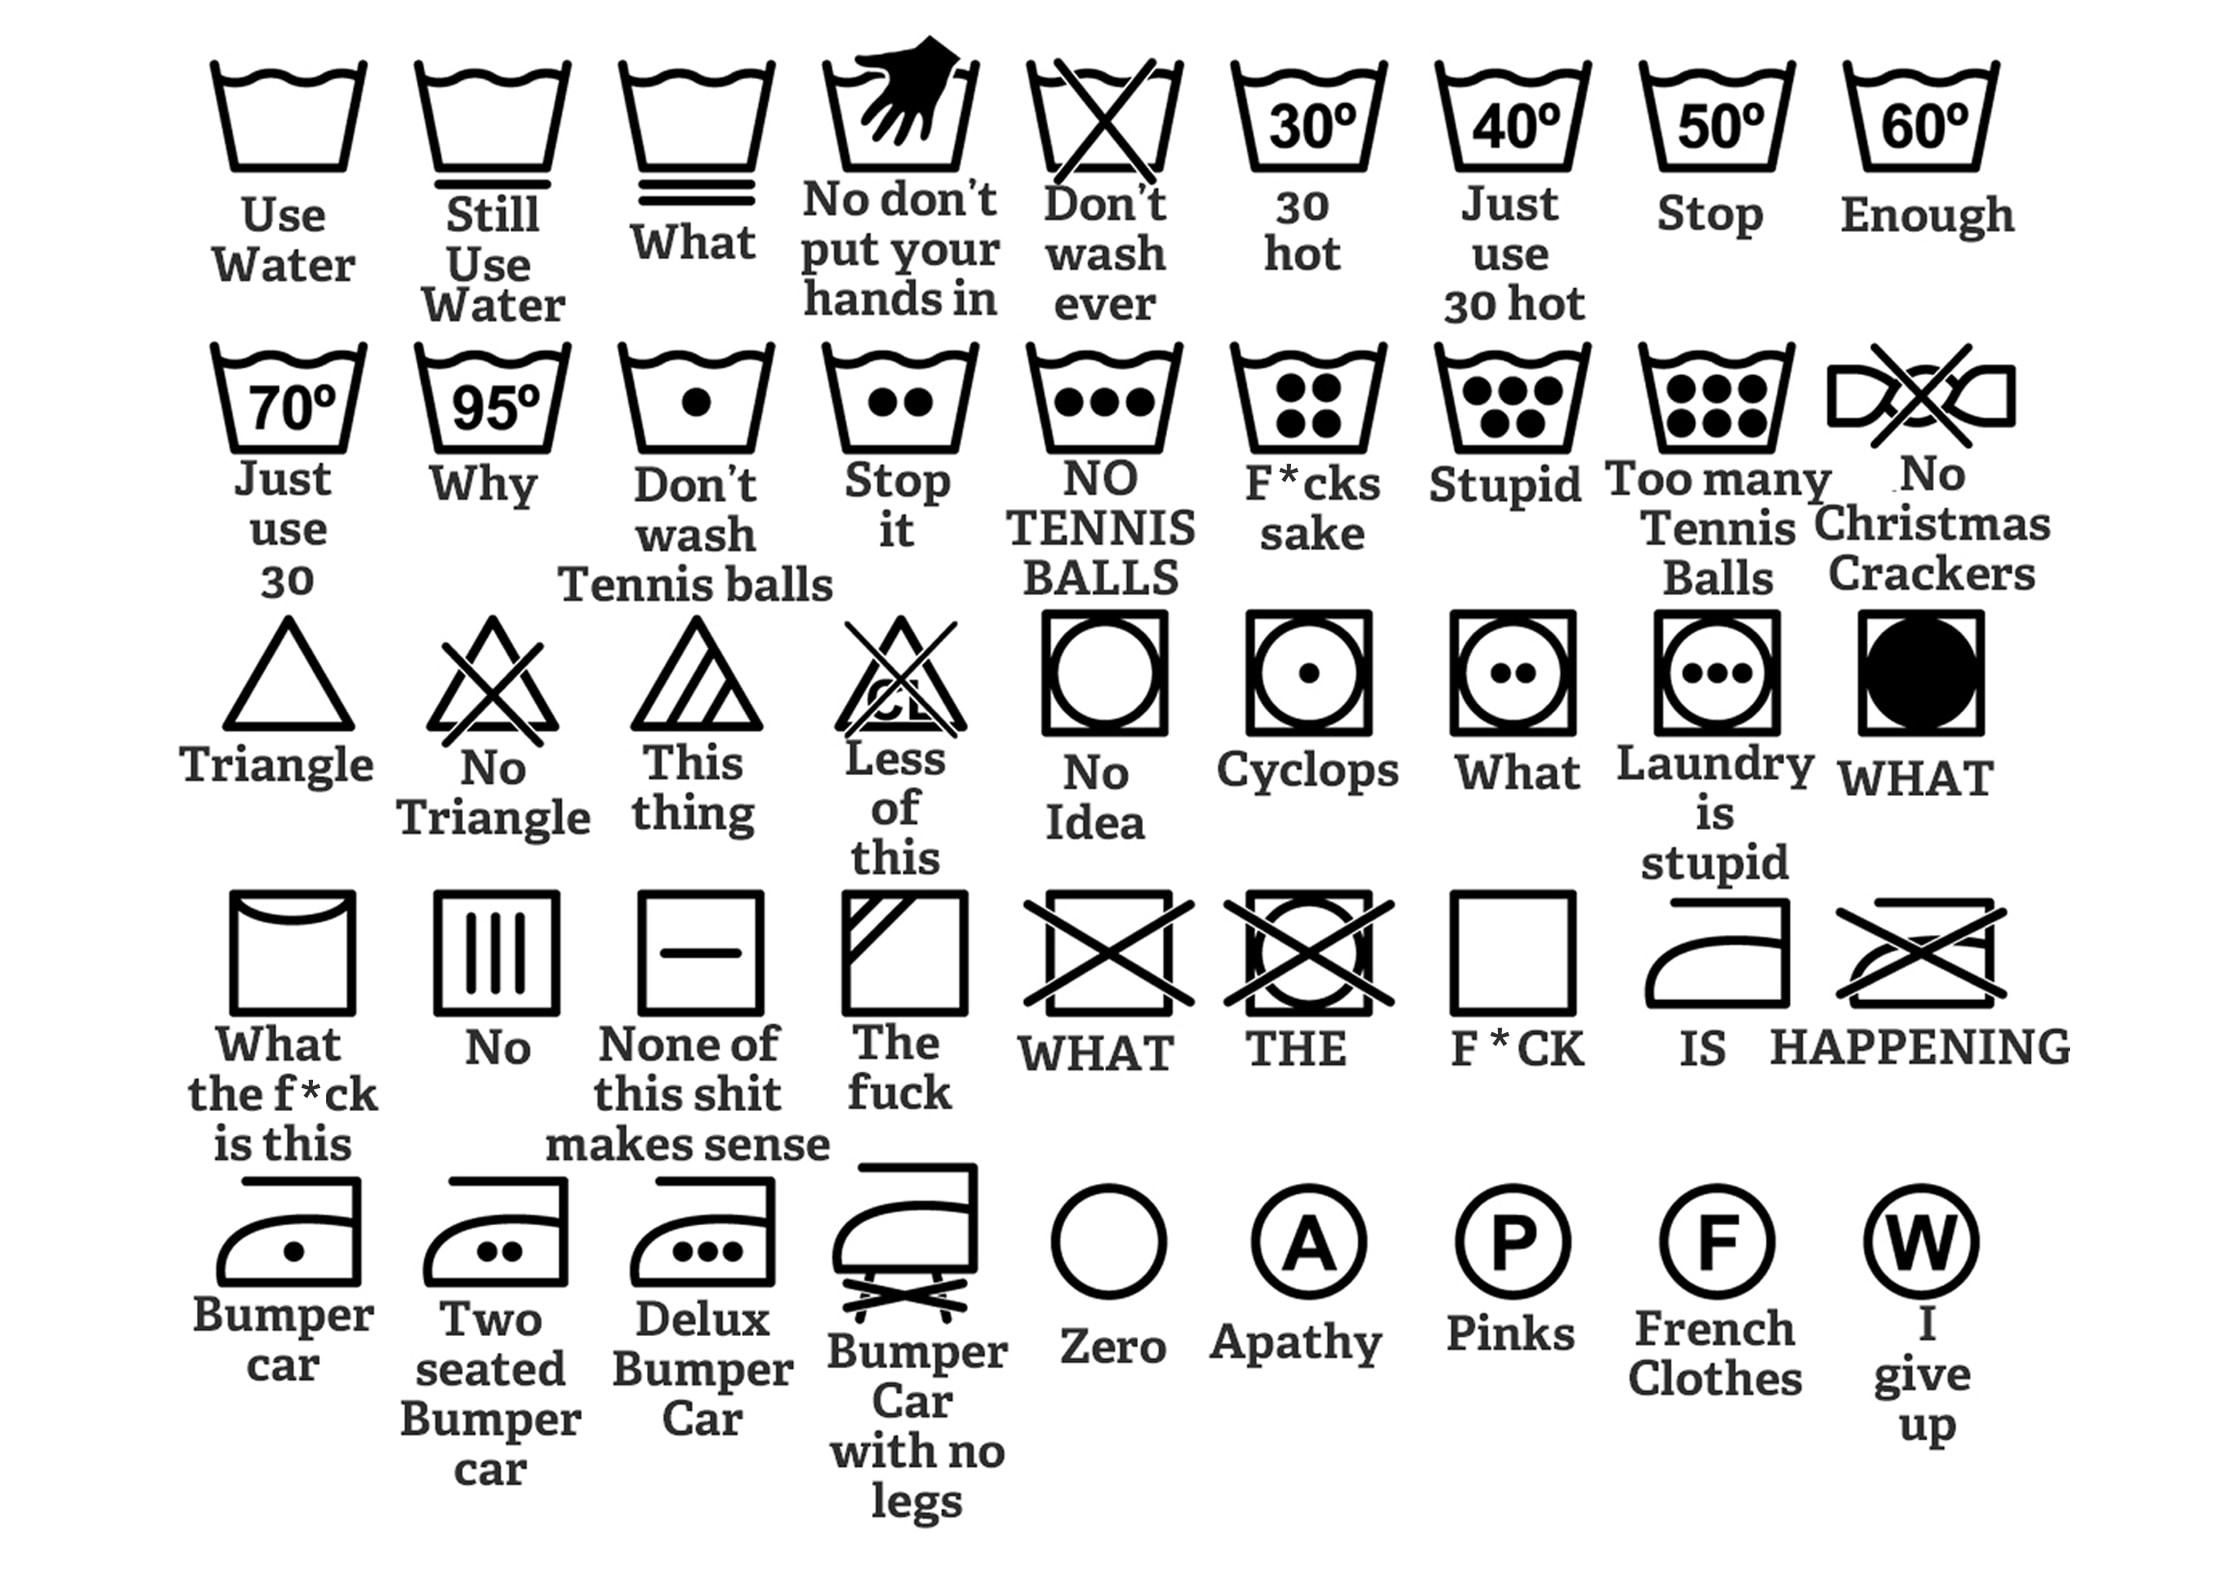 BS Interpretation of Care Labels